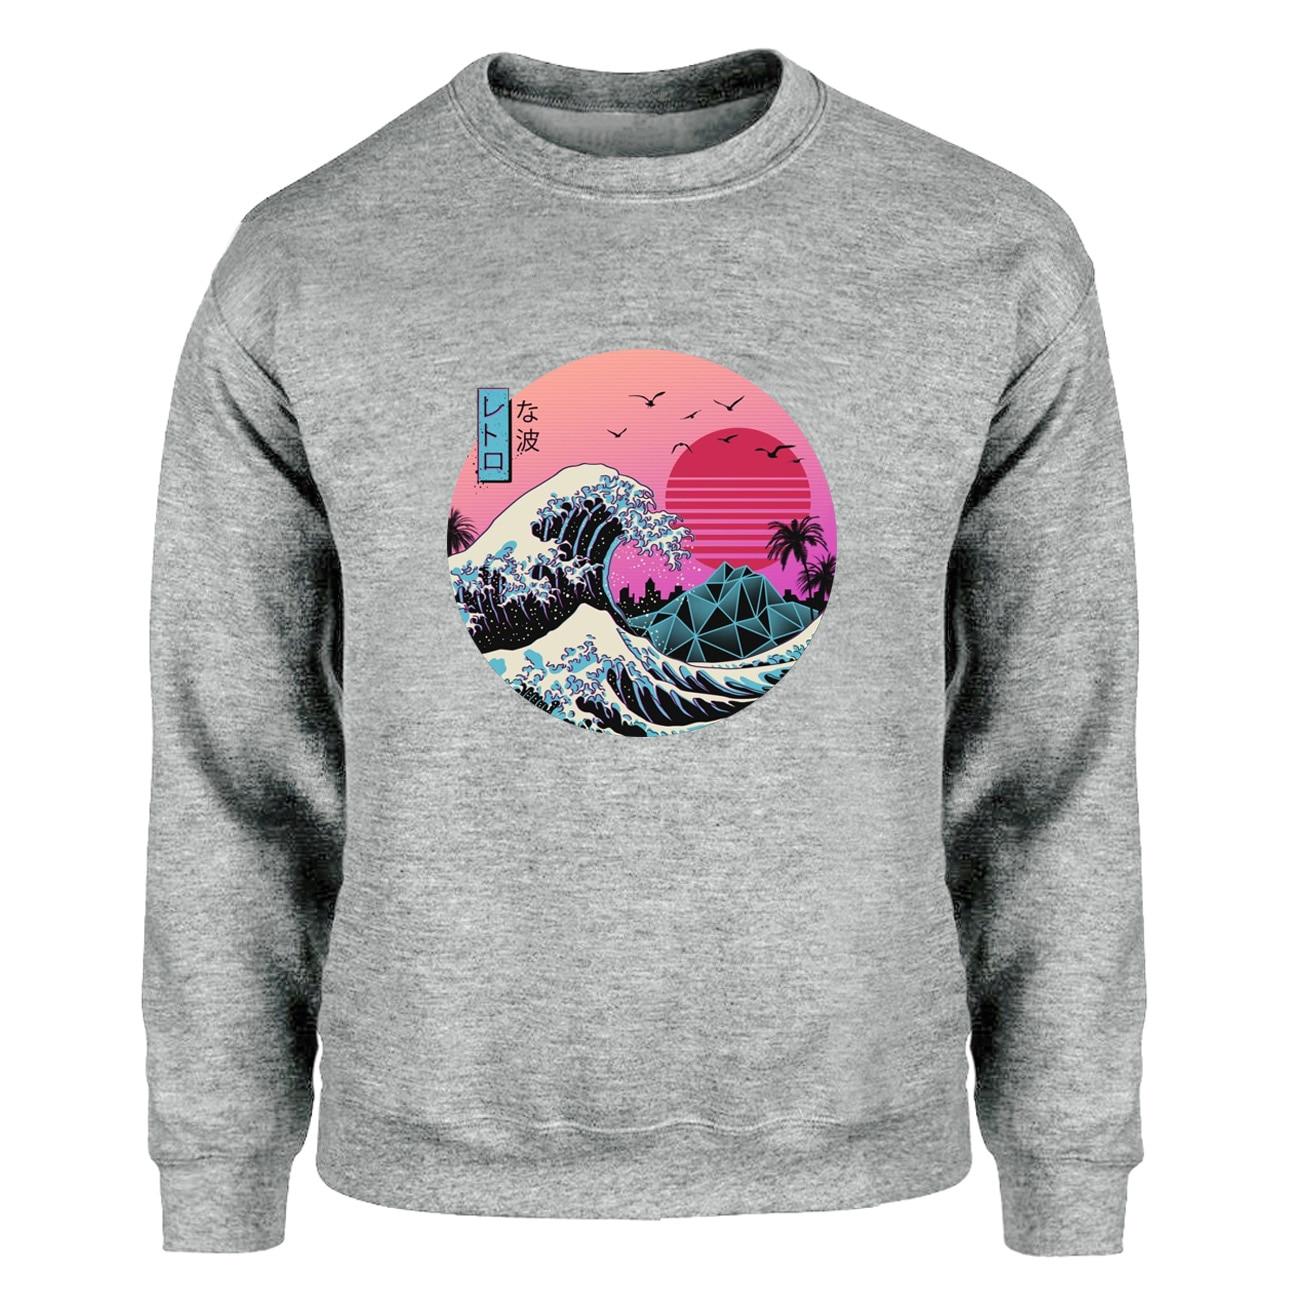 A grande onda retro japão anime vaporwave kanagawa sweatshirts moletom masculino crewneck moletons pintura raglan harajuku fleece streetwear